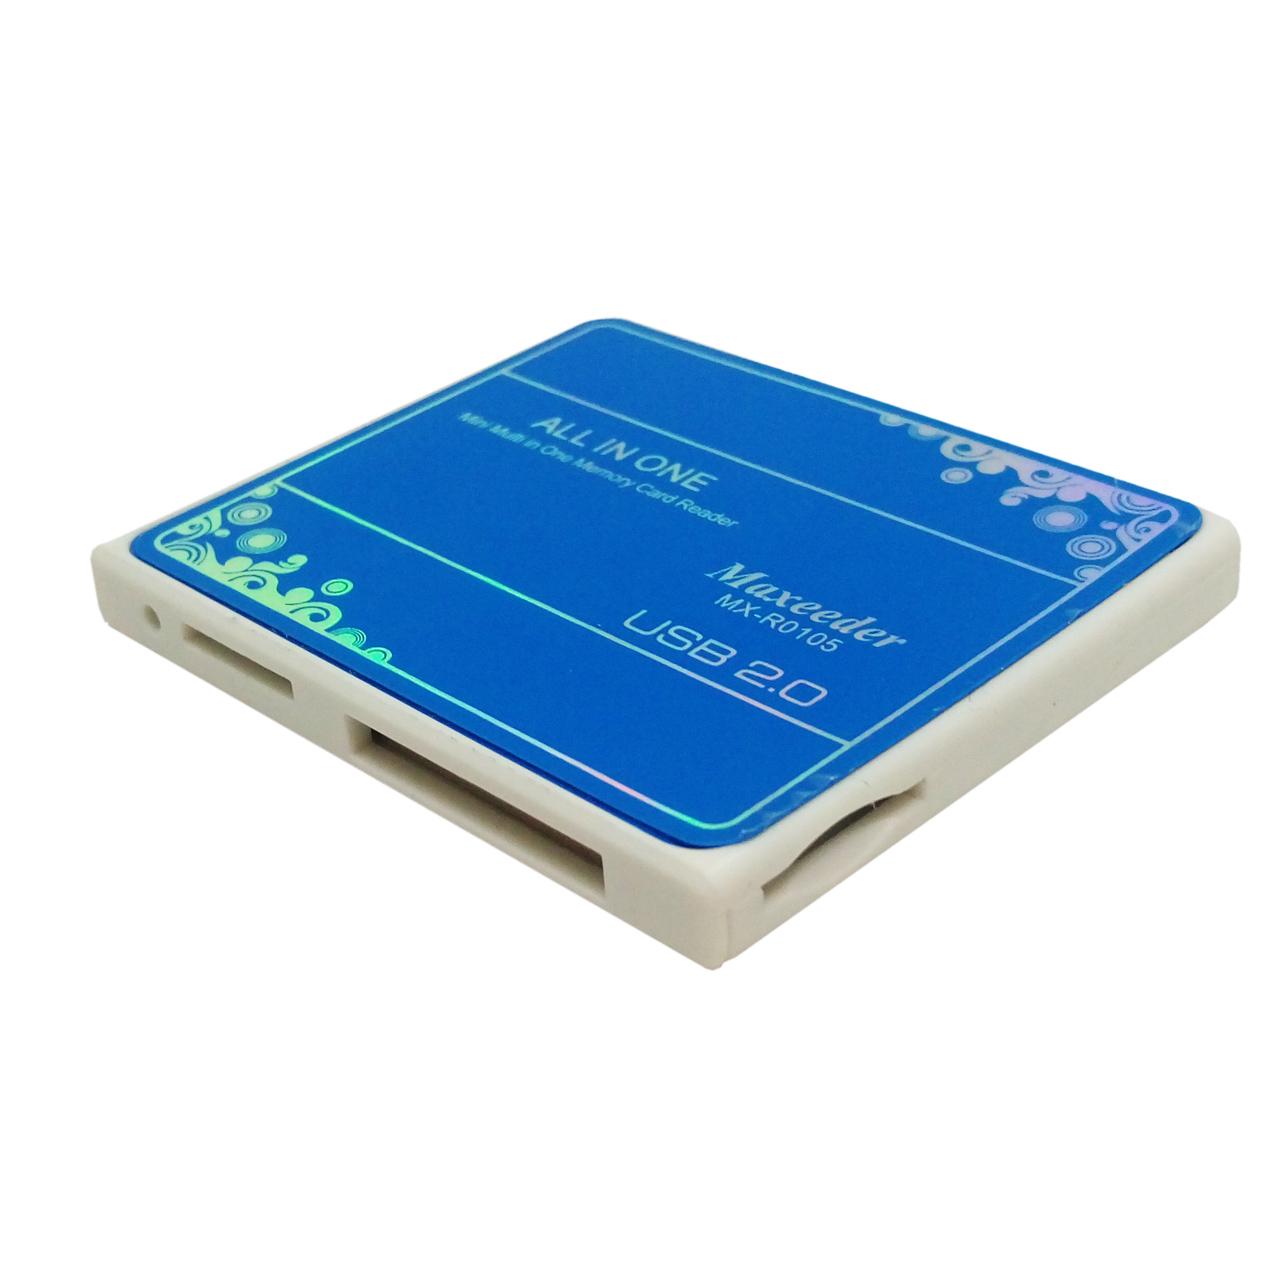 کارت خوان حافظه  مکسیدر MX-R0105